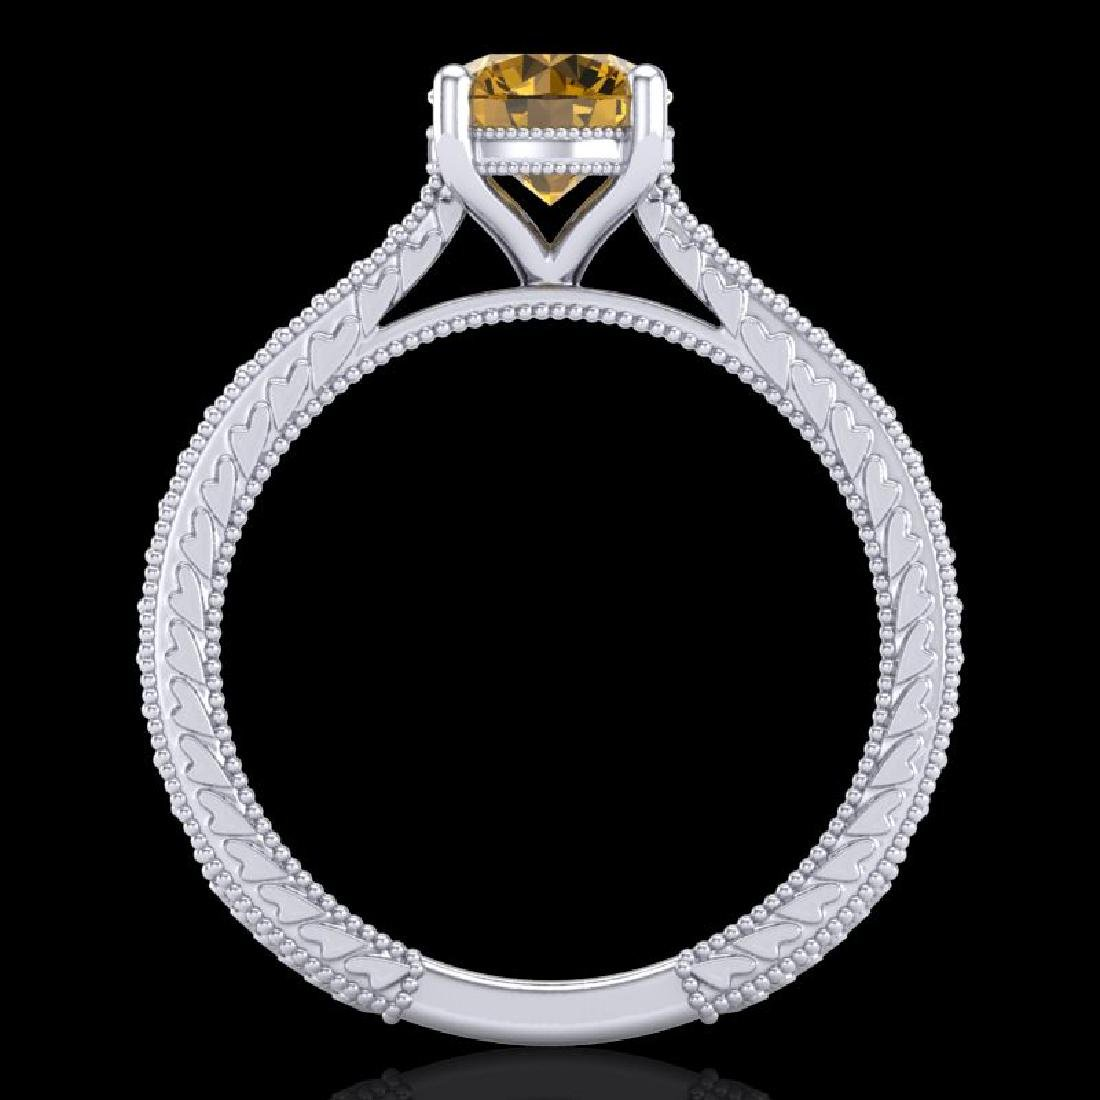 1.45 CTW Intense Fancy Yellow Diamond Engagement Art - 3